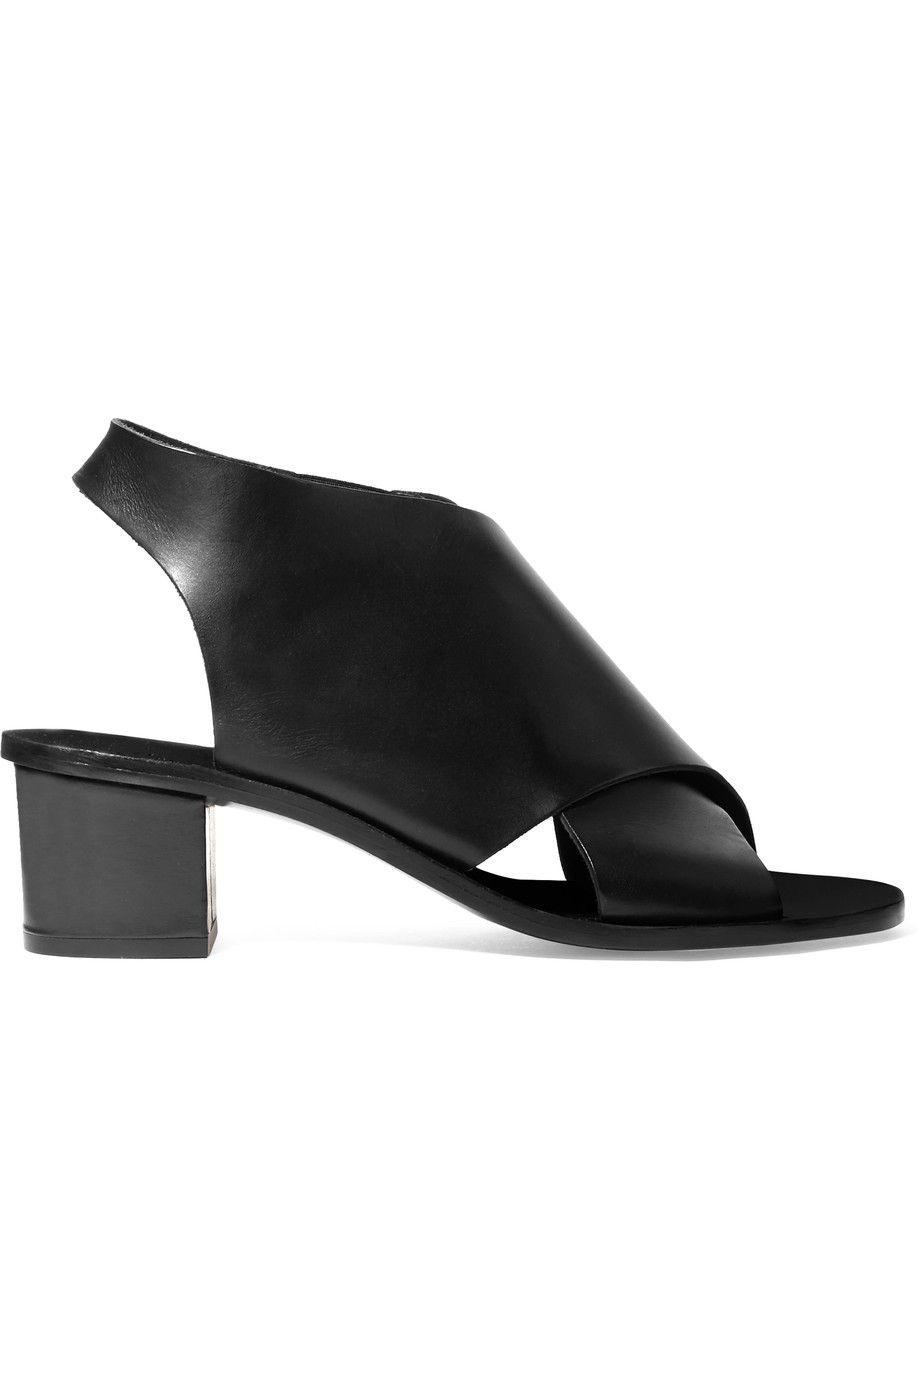 FOOTWEAR - Sandals ATP Atelier hkvftr6